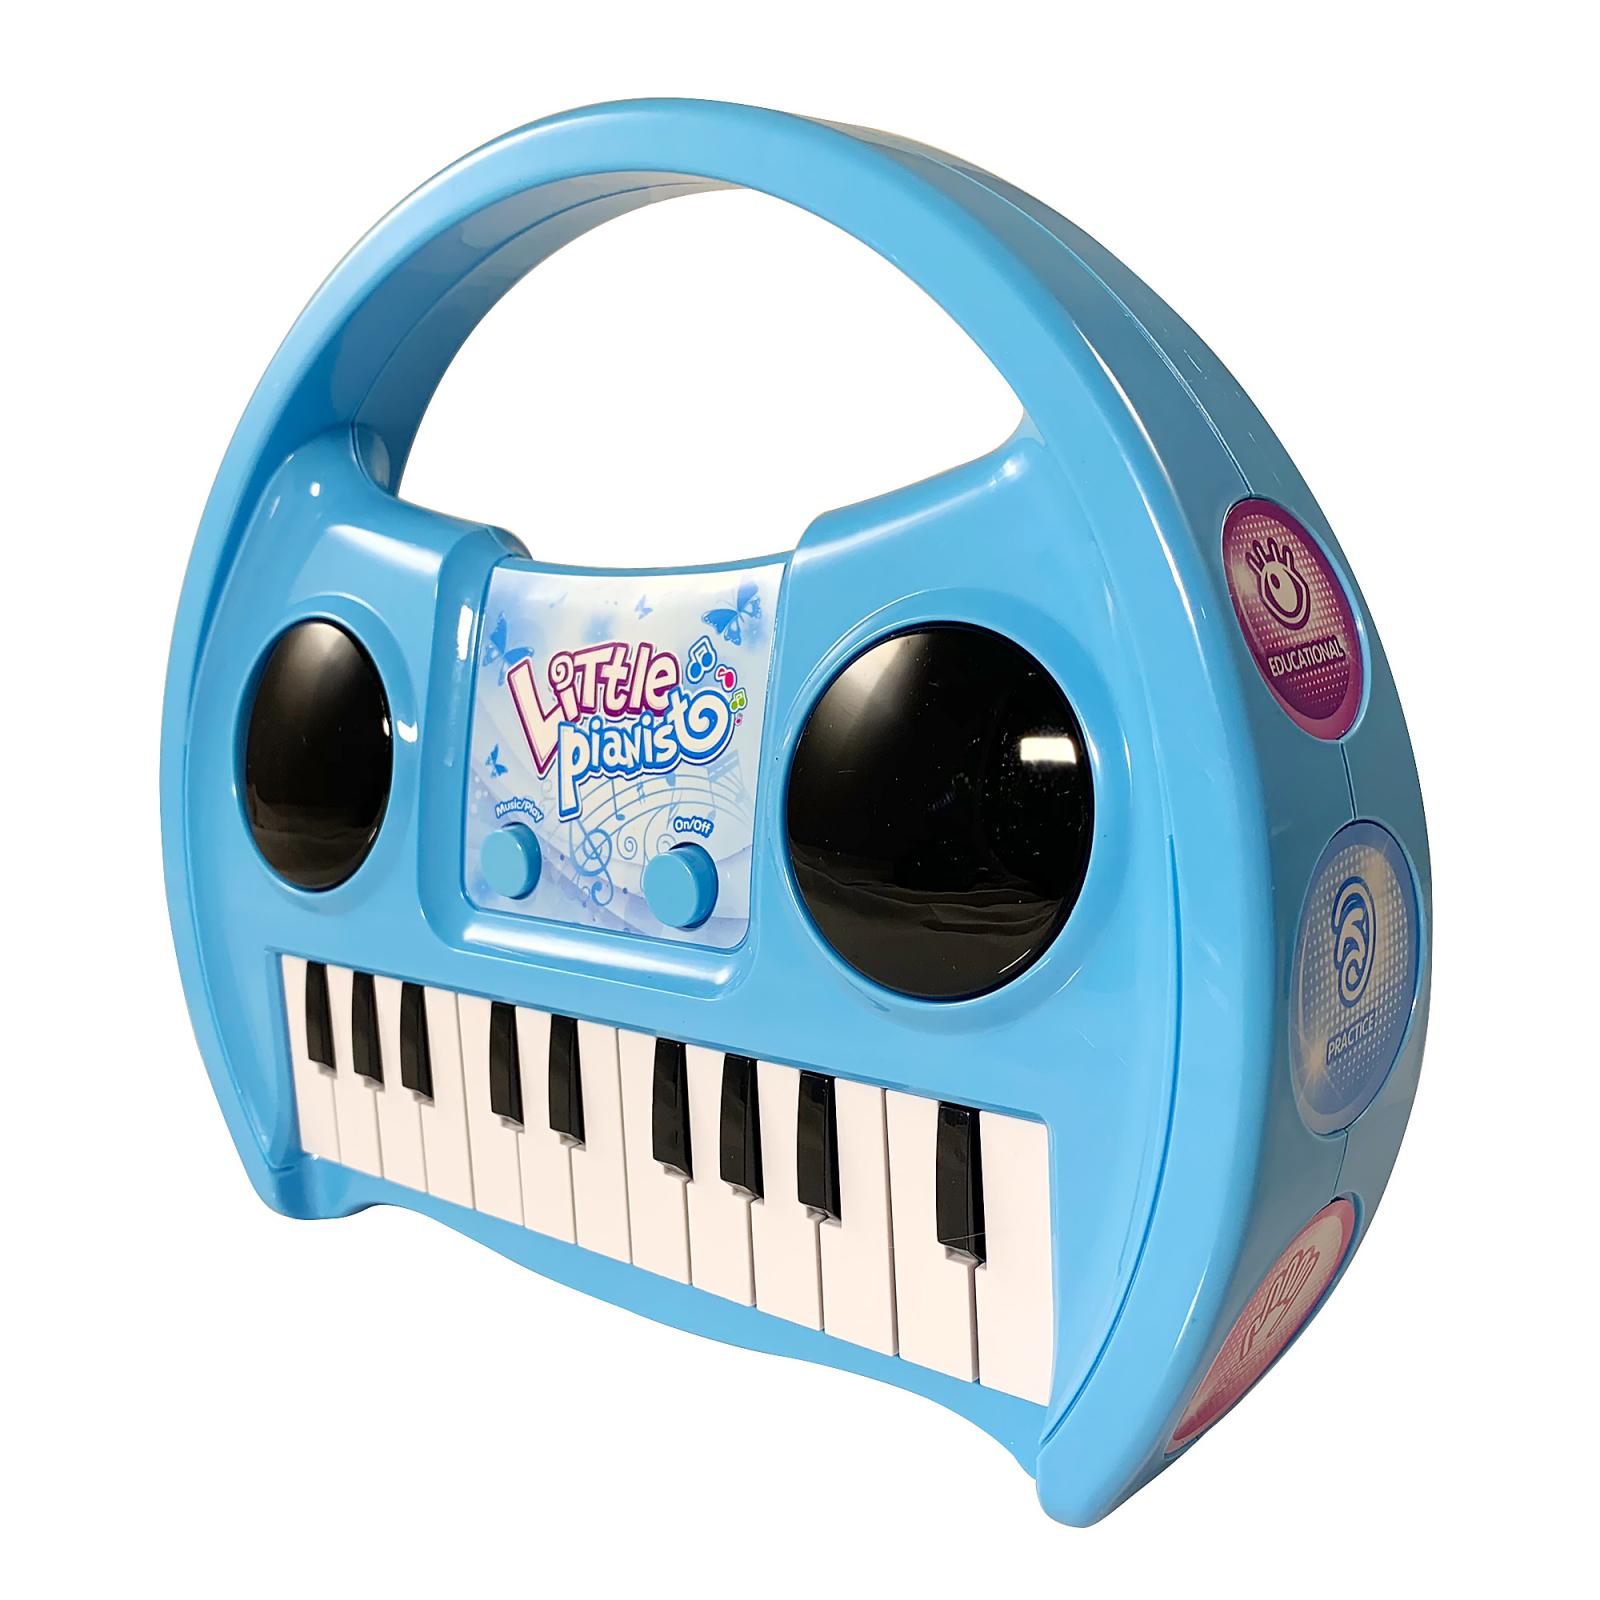 KidPlay Products Little Pianist Singing Musical Karaoke Keyboard Lights Up Blue